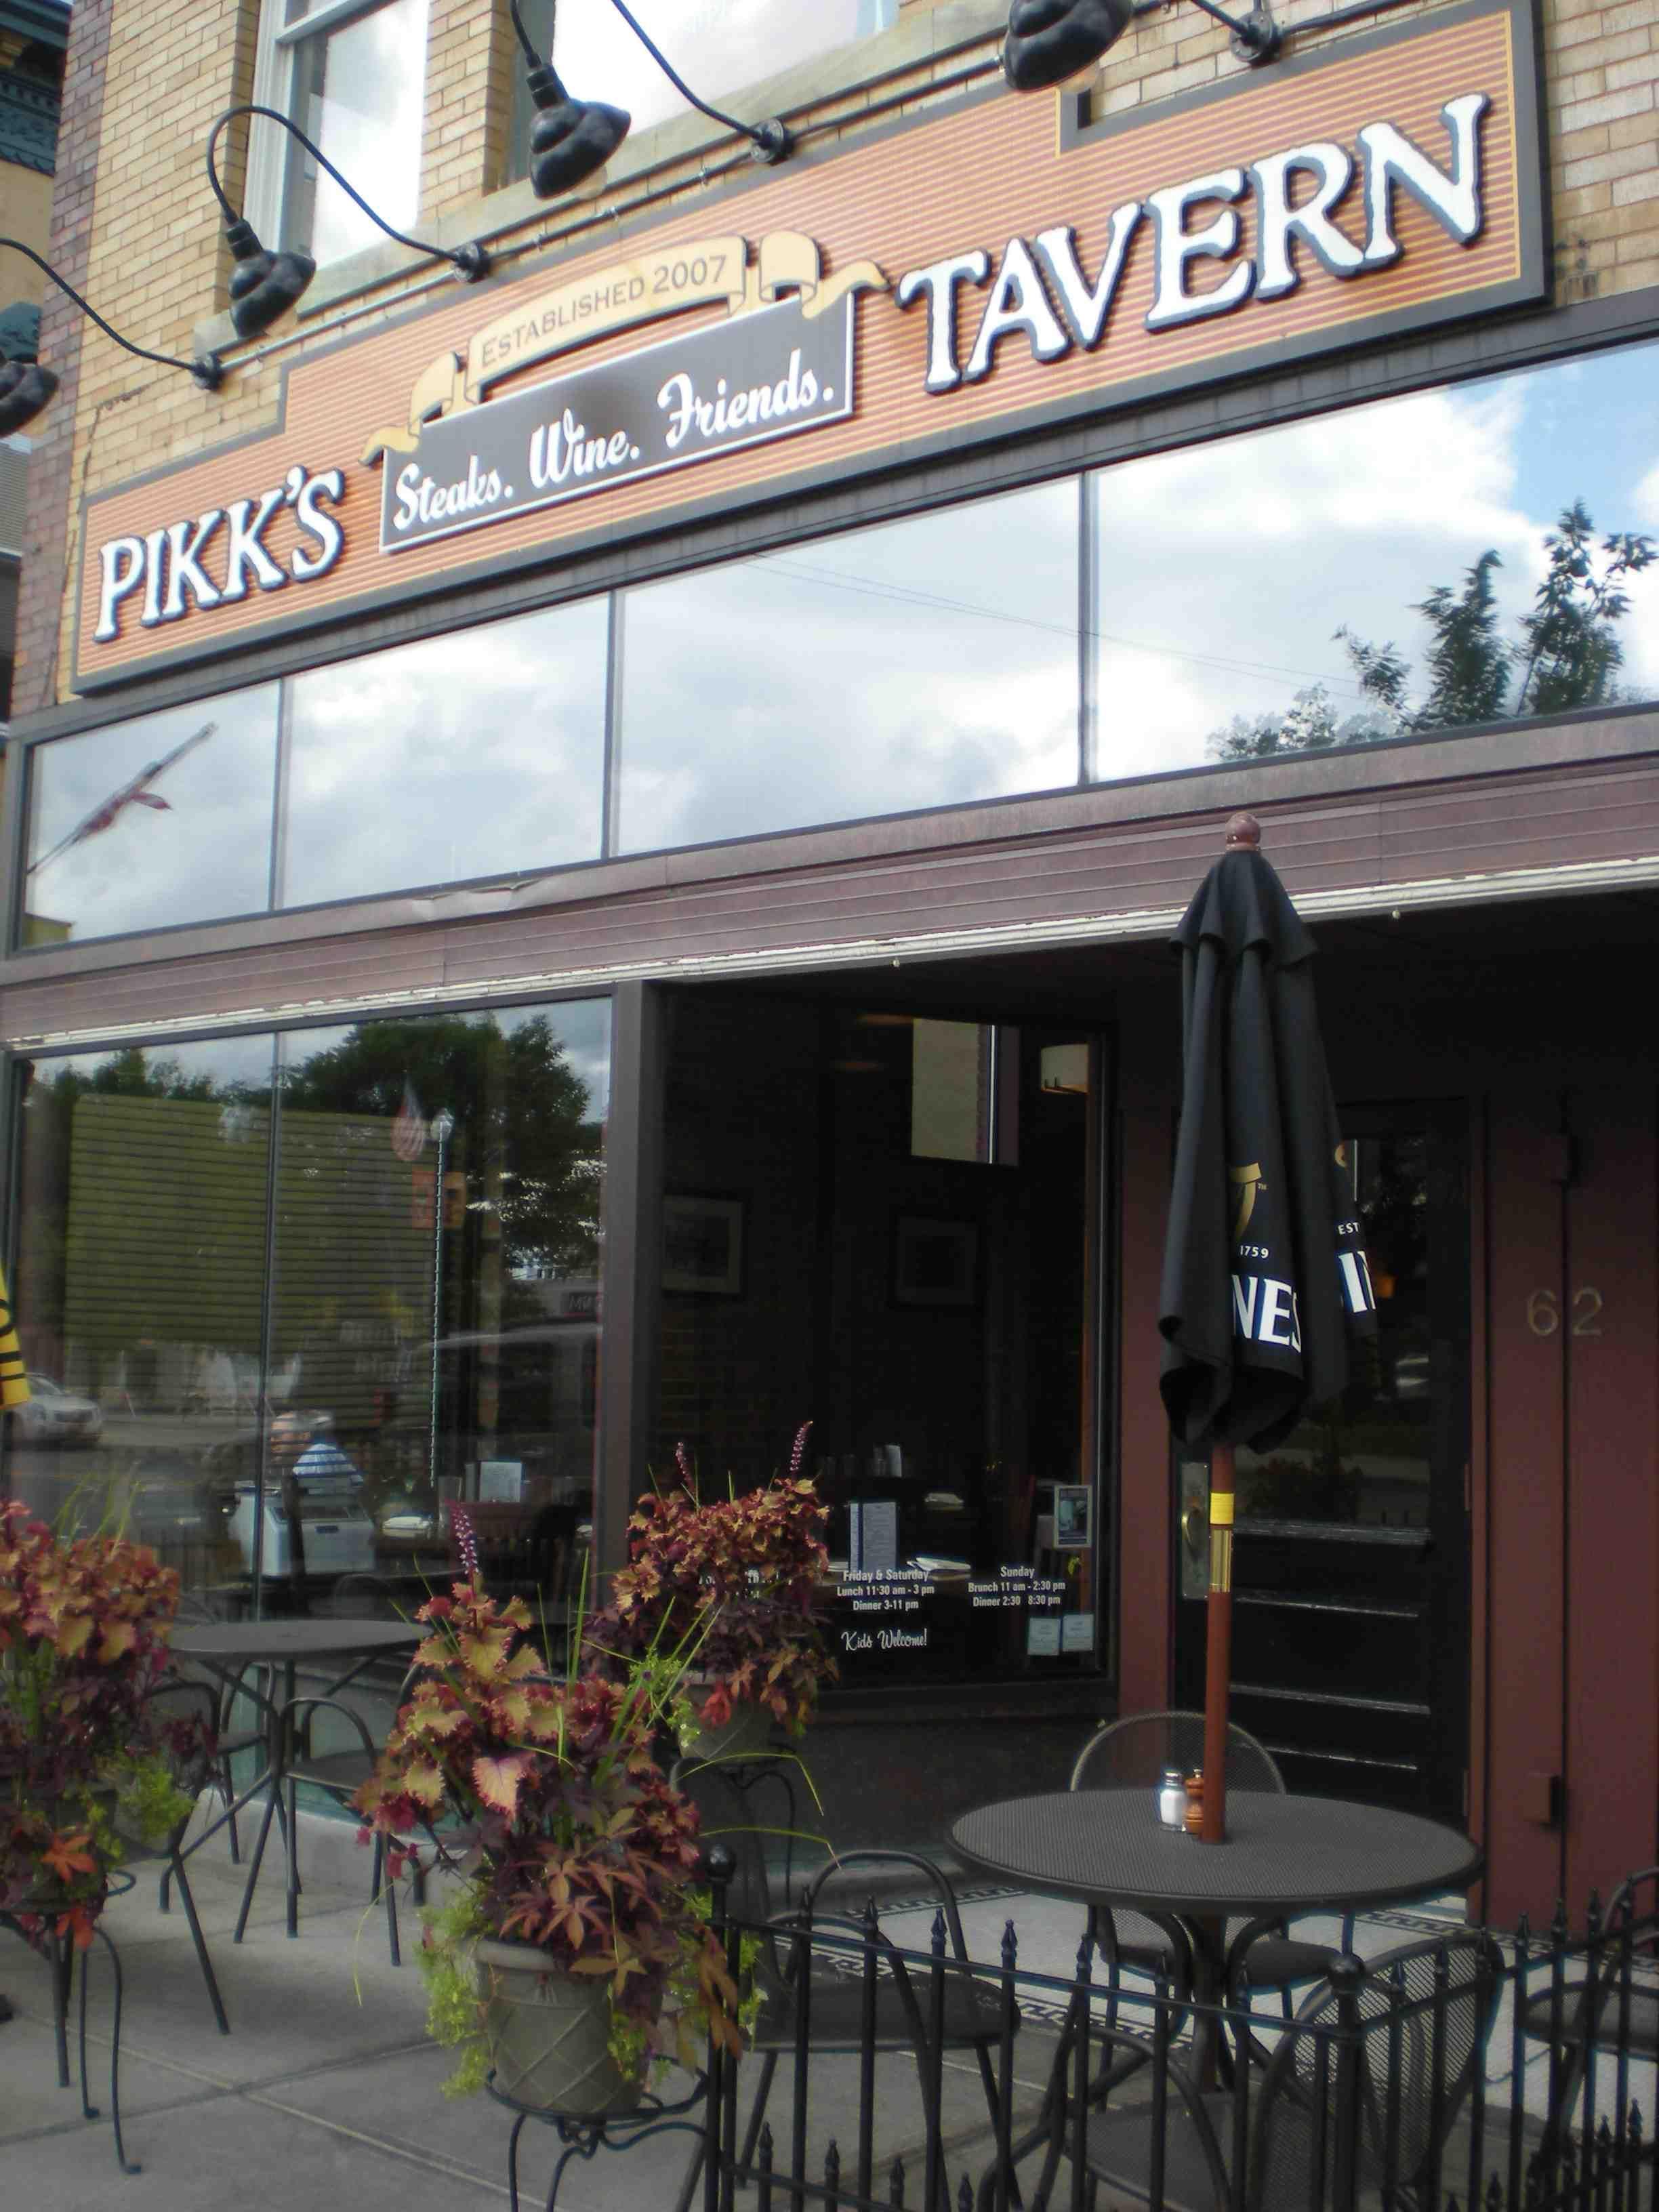 Pikk's Tavern in Valparaiso, Indiana | bigcity. | Indiana ...